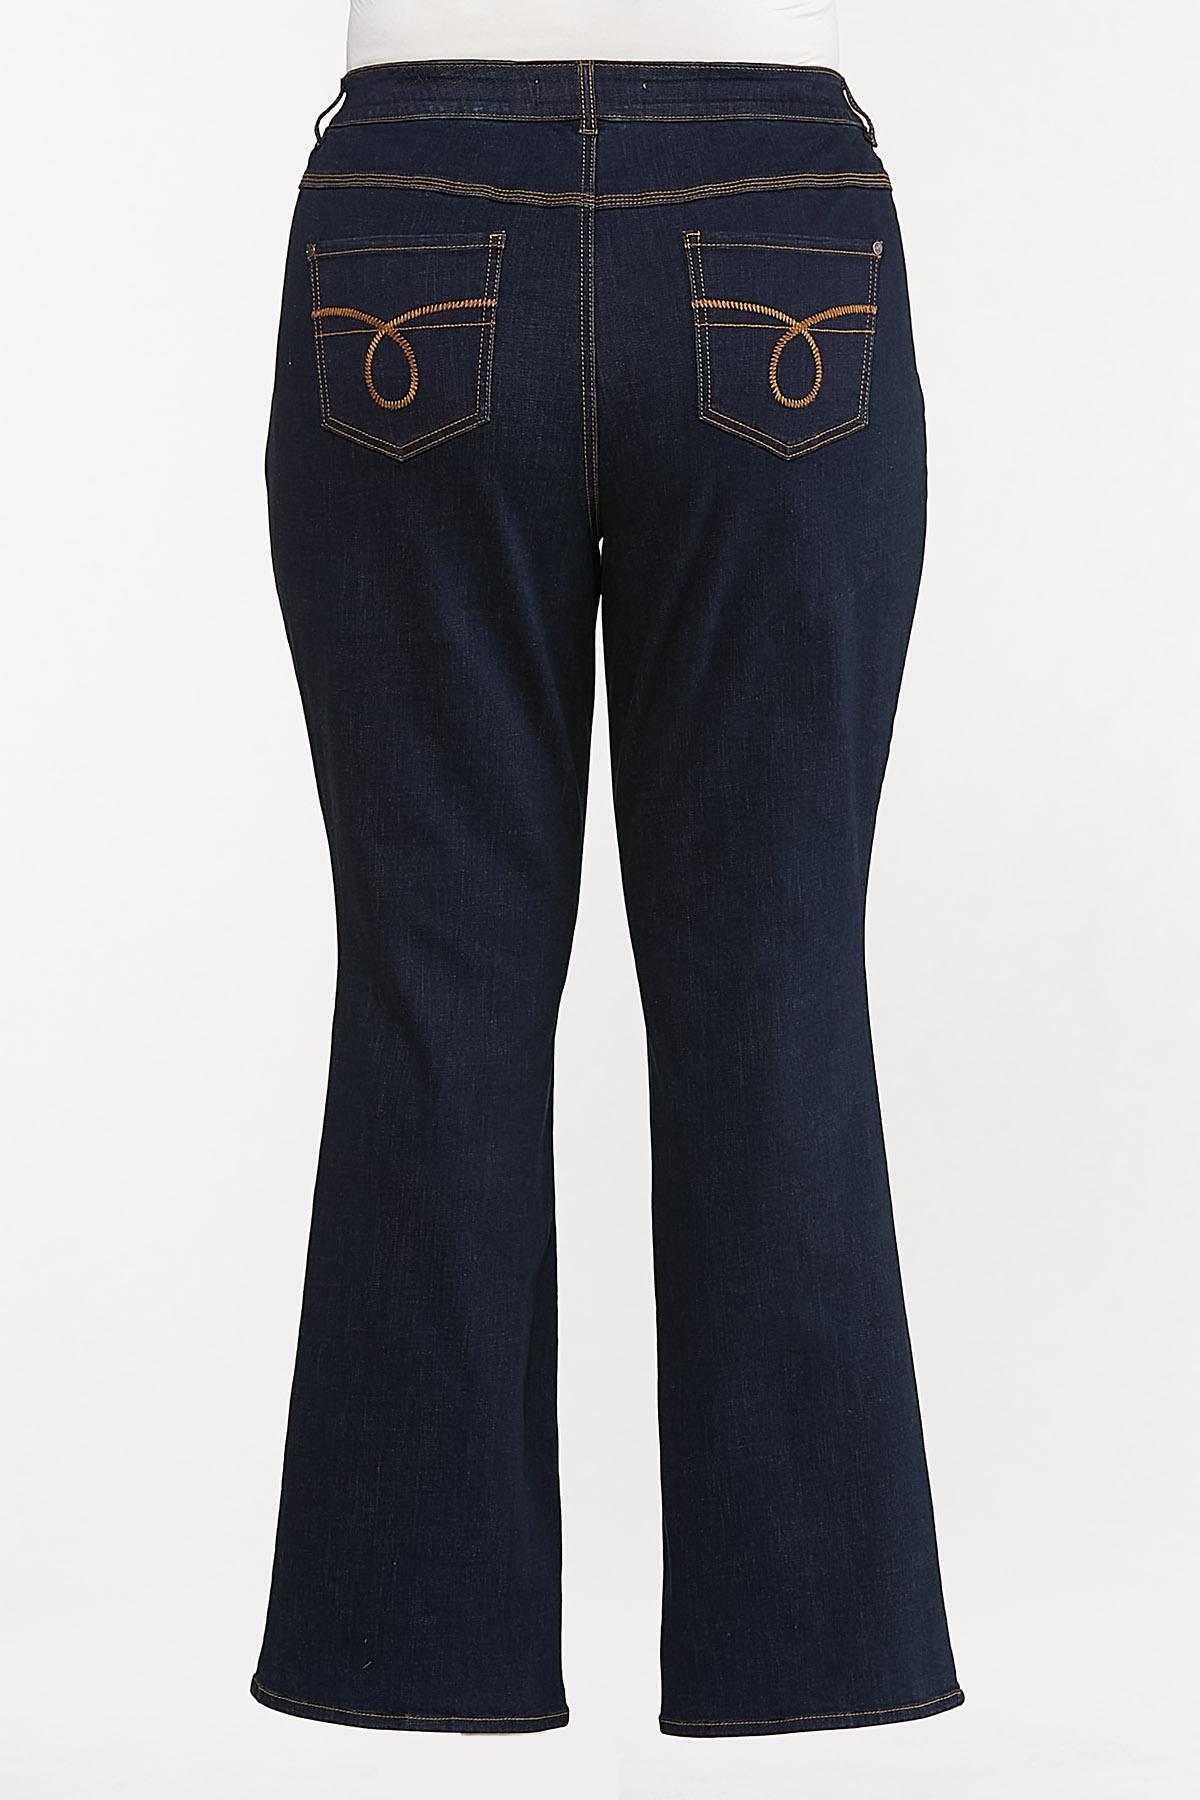 Plus Size Dark Bootcut Jeans (Item #44664770)